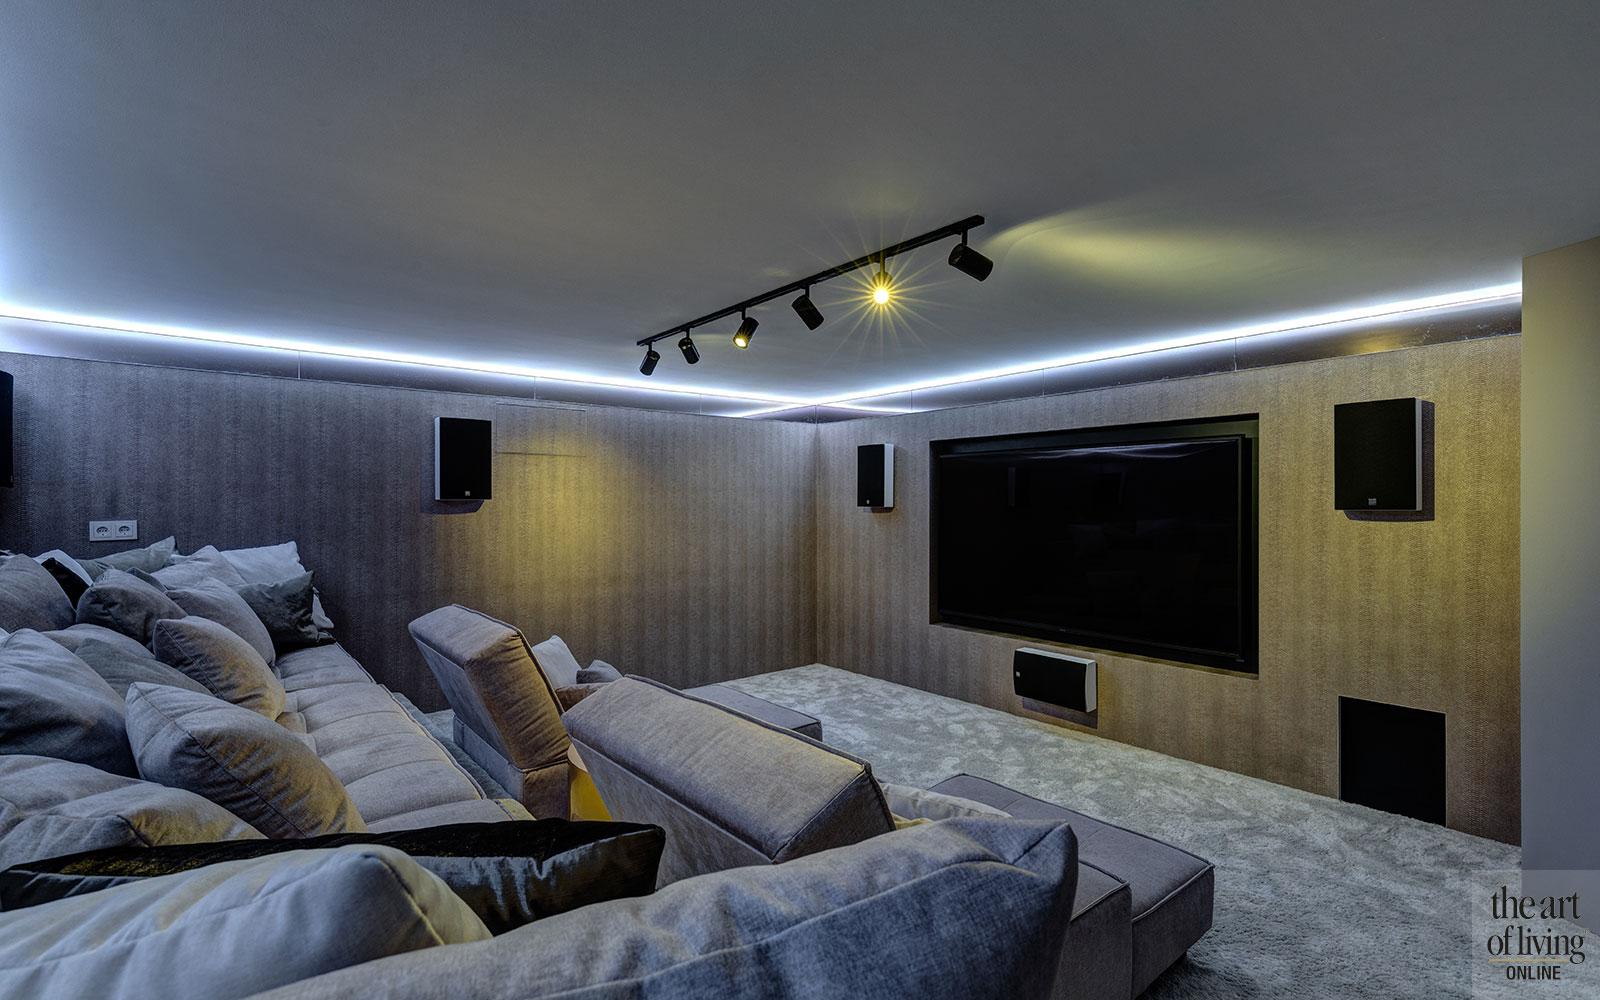 home entertainment, thuisbioscoop, domotica, bioscoop thuis